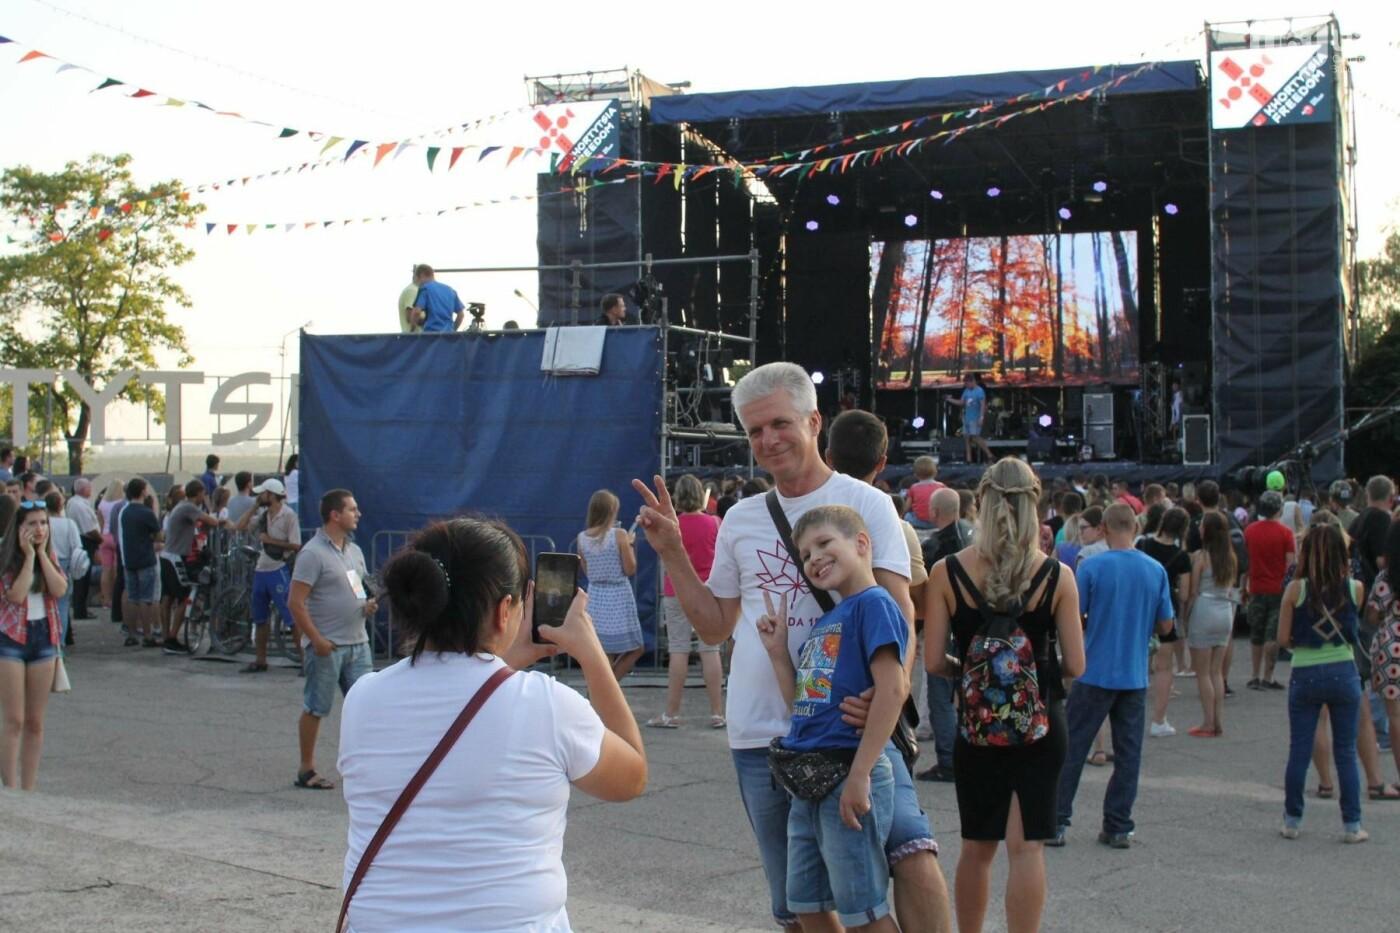 Найди себя: 50 портретов посетителей фестиваля Khortytsia Freedom, – ФОТОРЕПОРТАЖ, фото-1